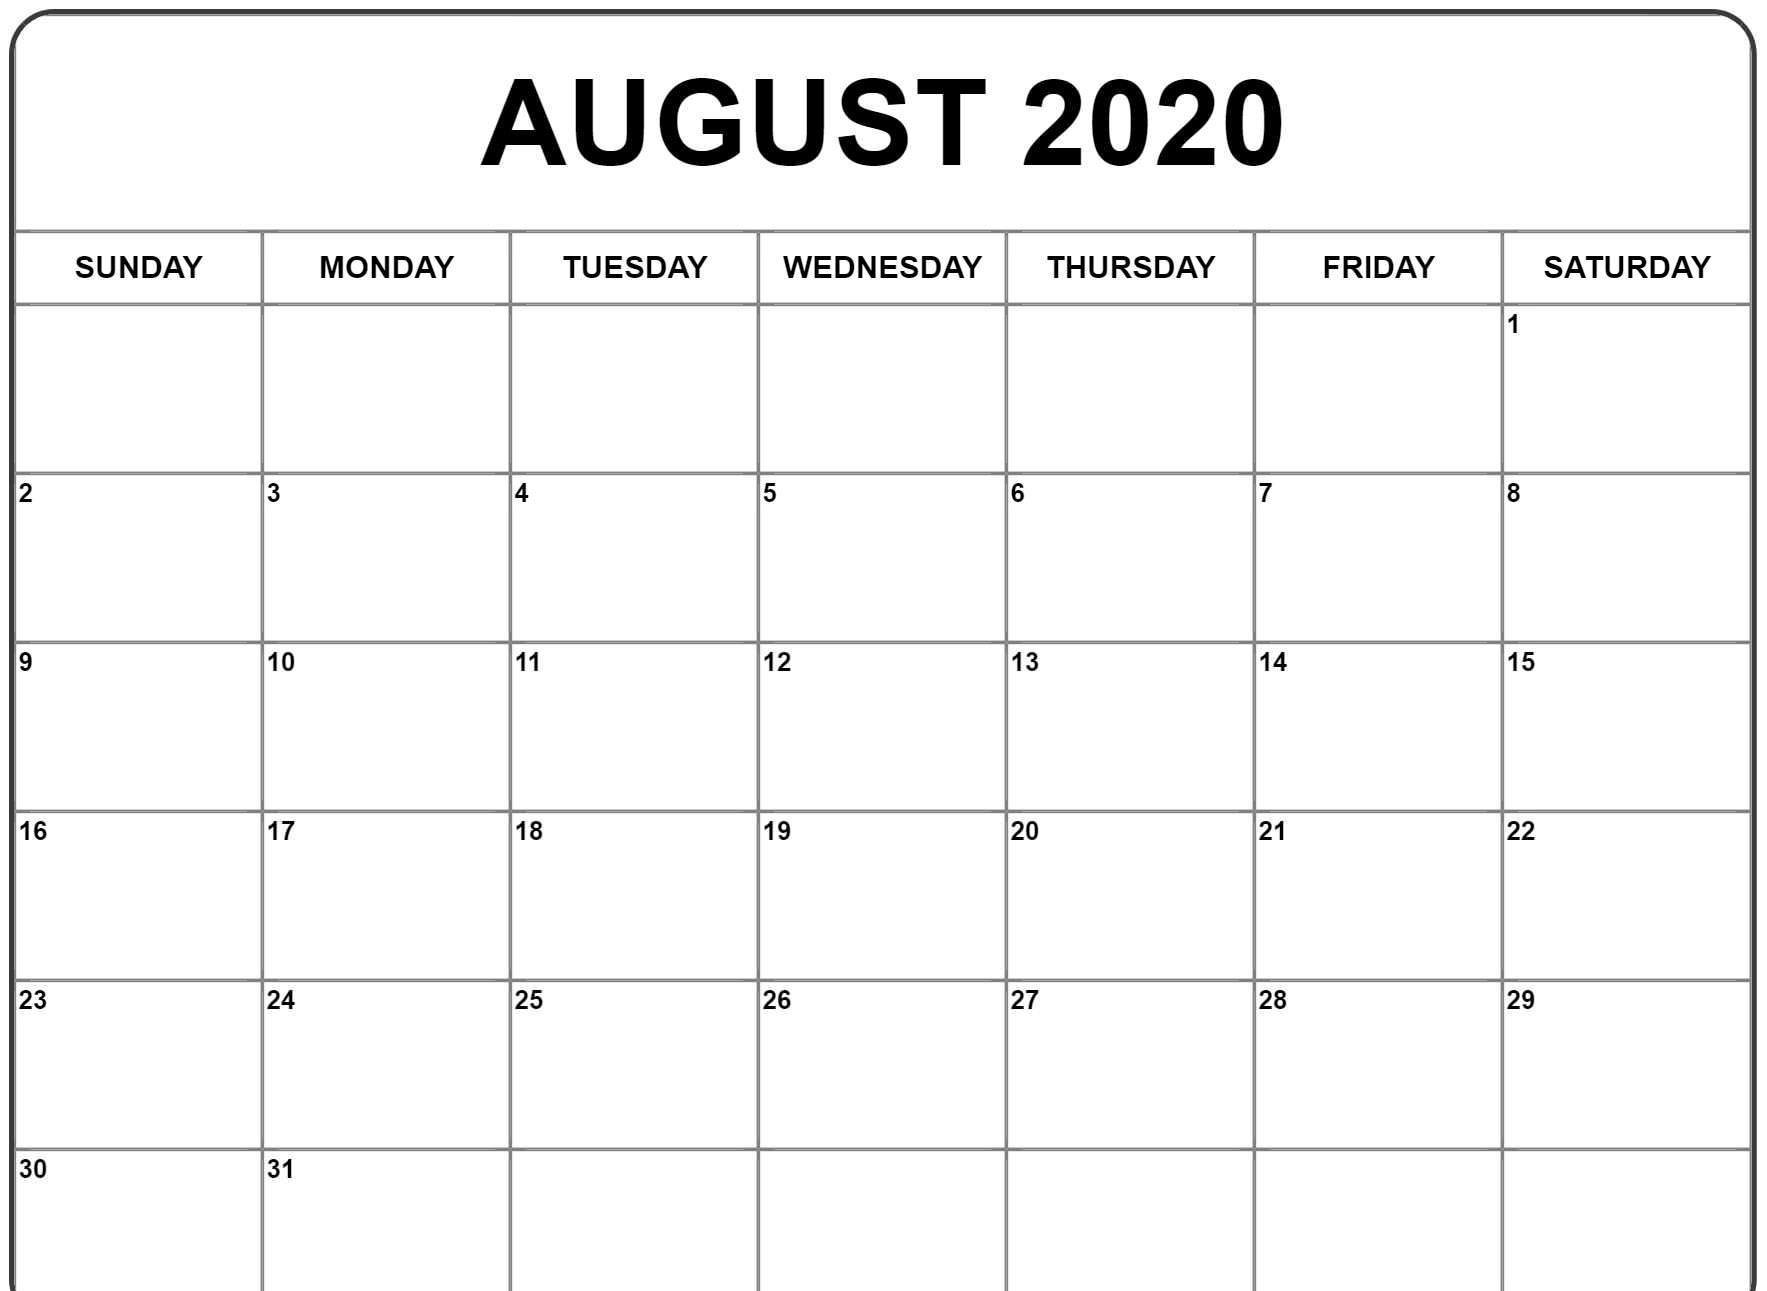 August 2020 Calendar Pdf, Word, Excel Printable Template-January 2020 Calendar Excel